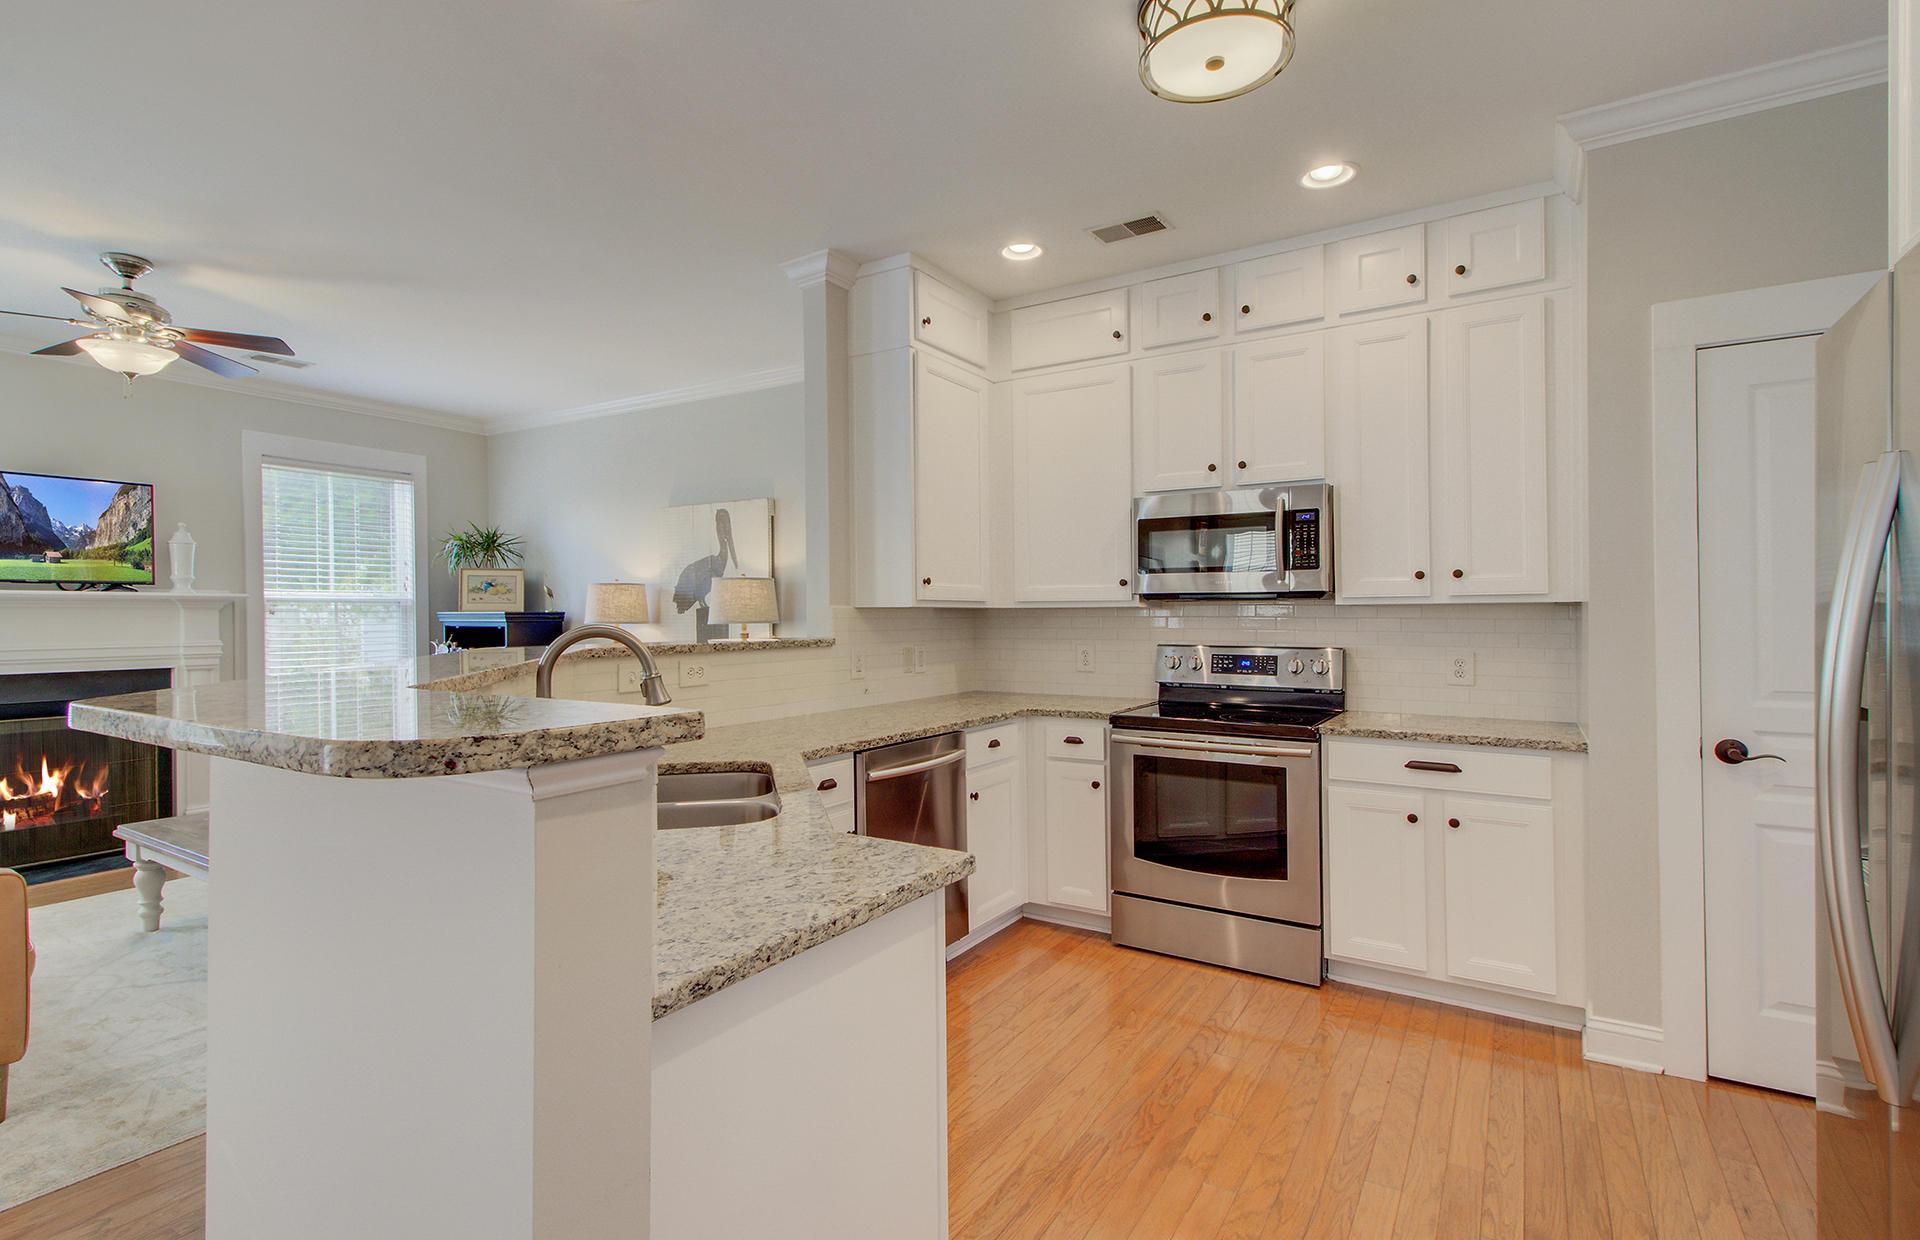 New Parrish Village Homes For Sale - 1109 Dawn View, Mount Pleasant, SC - 8